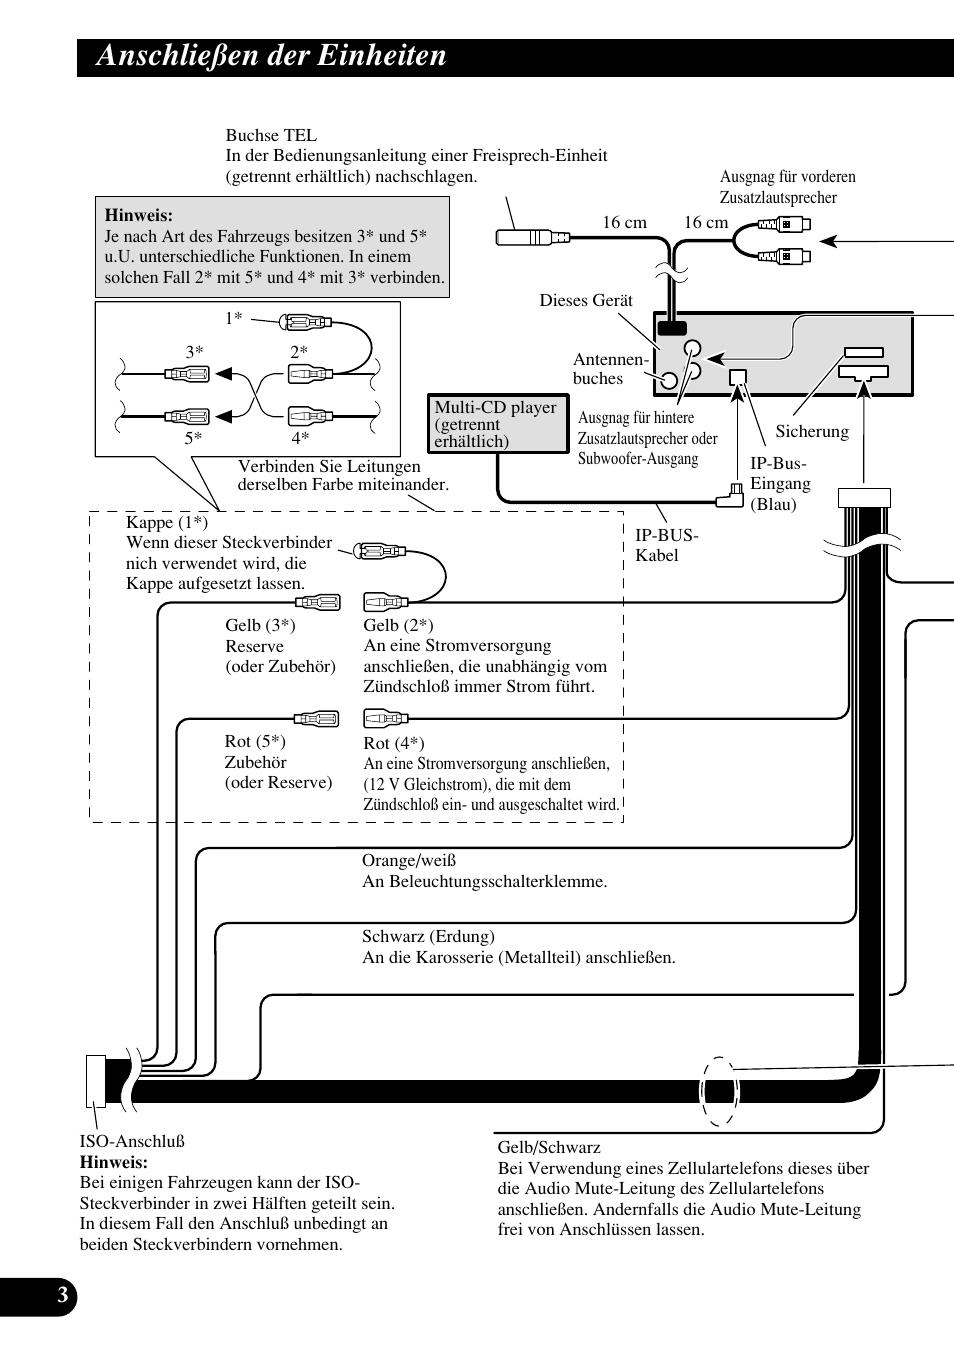 Großzügig Diagramm Anschliessen Ideen - Der Schaltplan - triangre.info